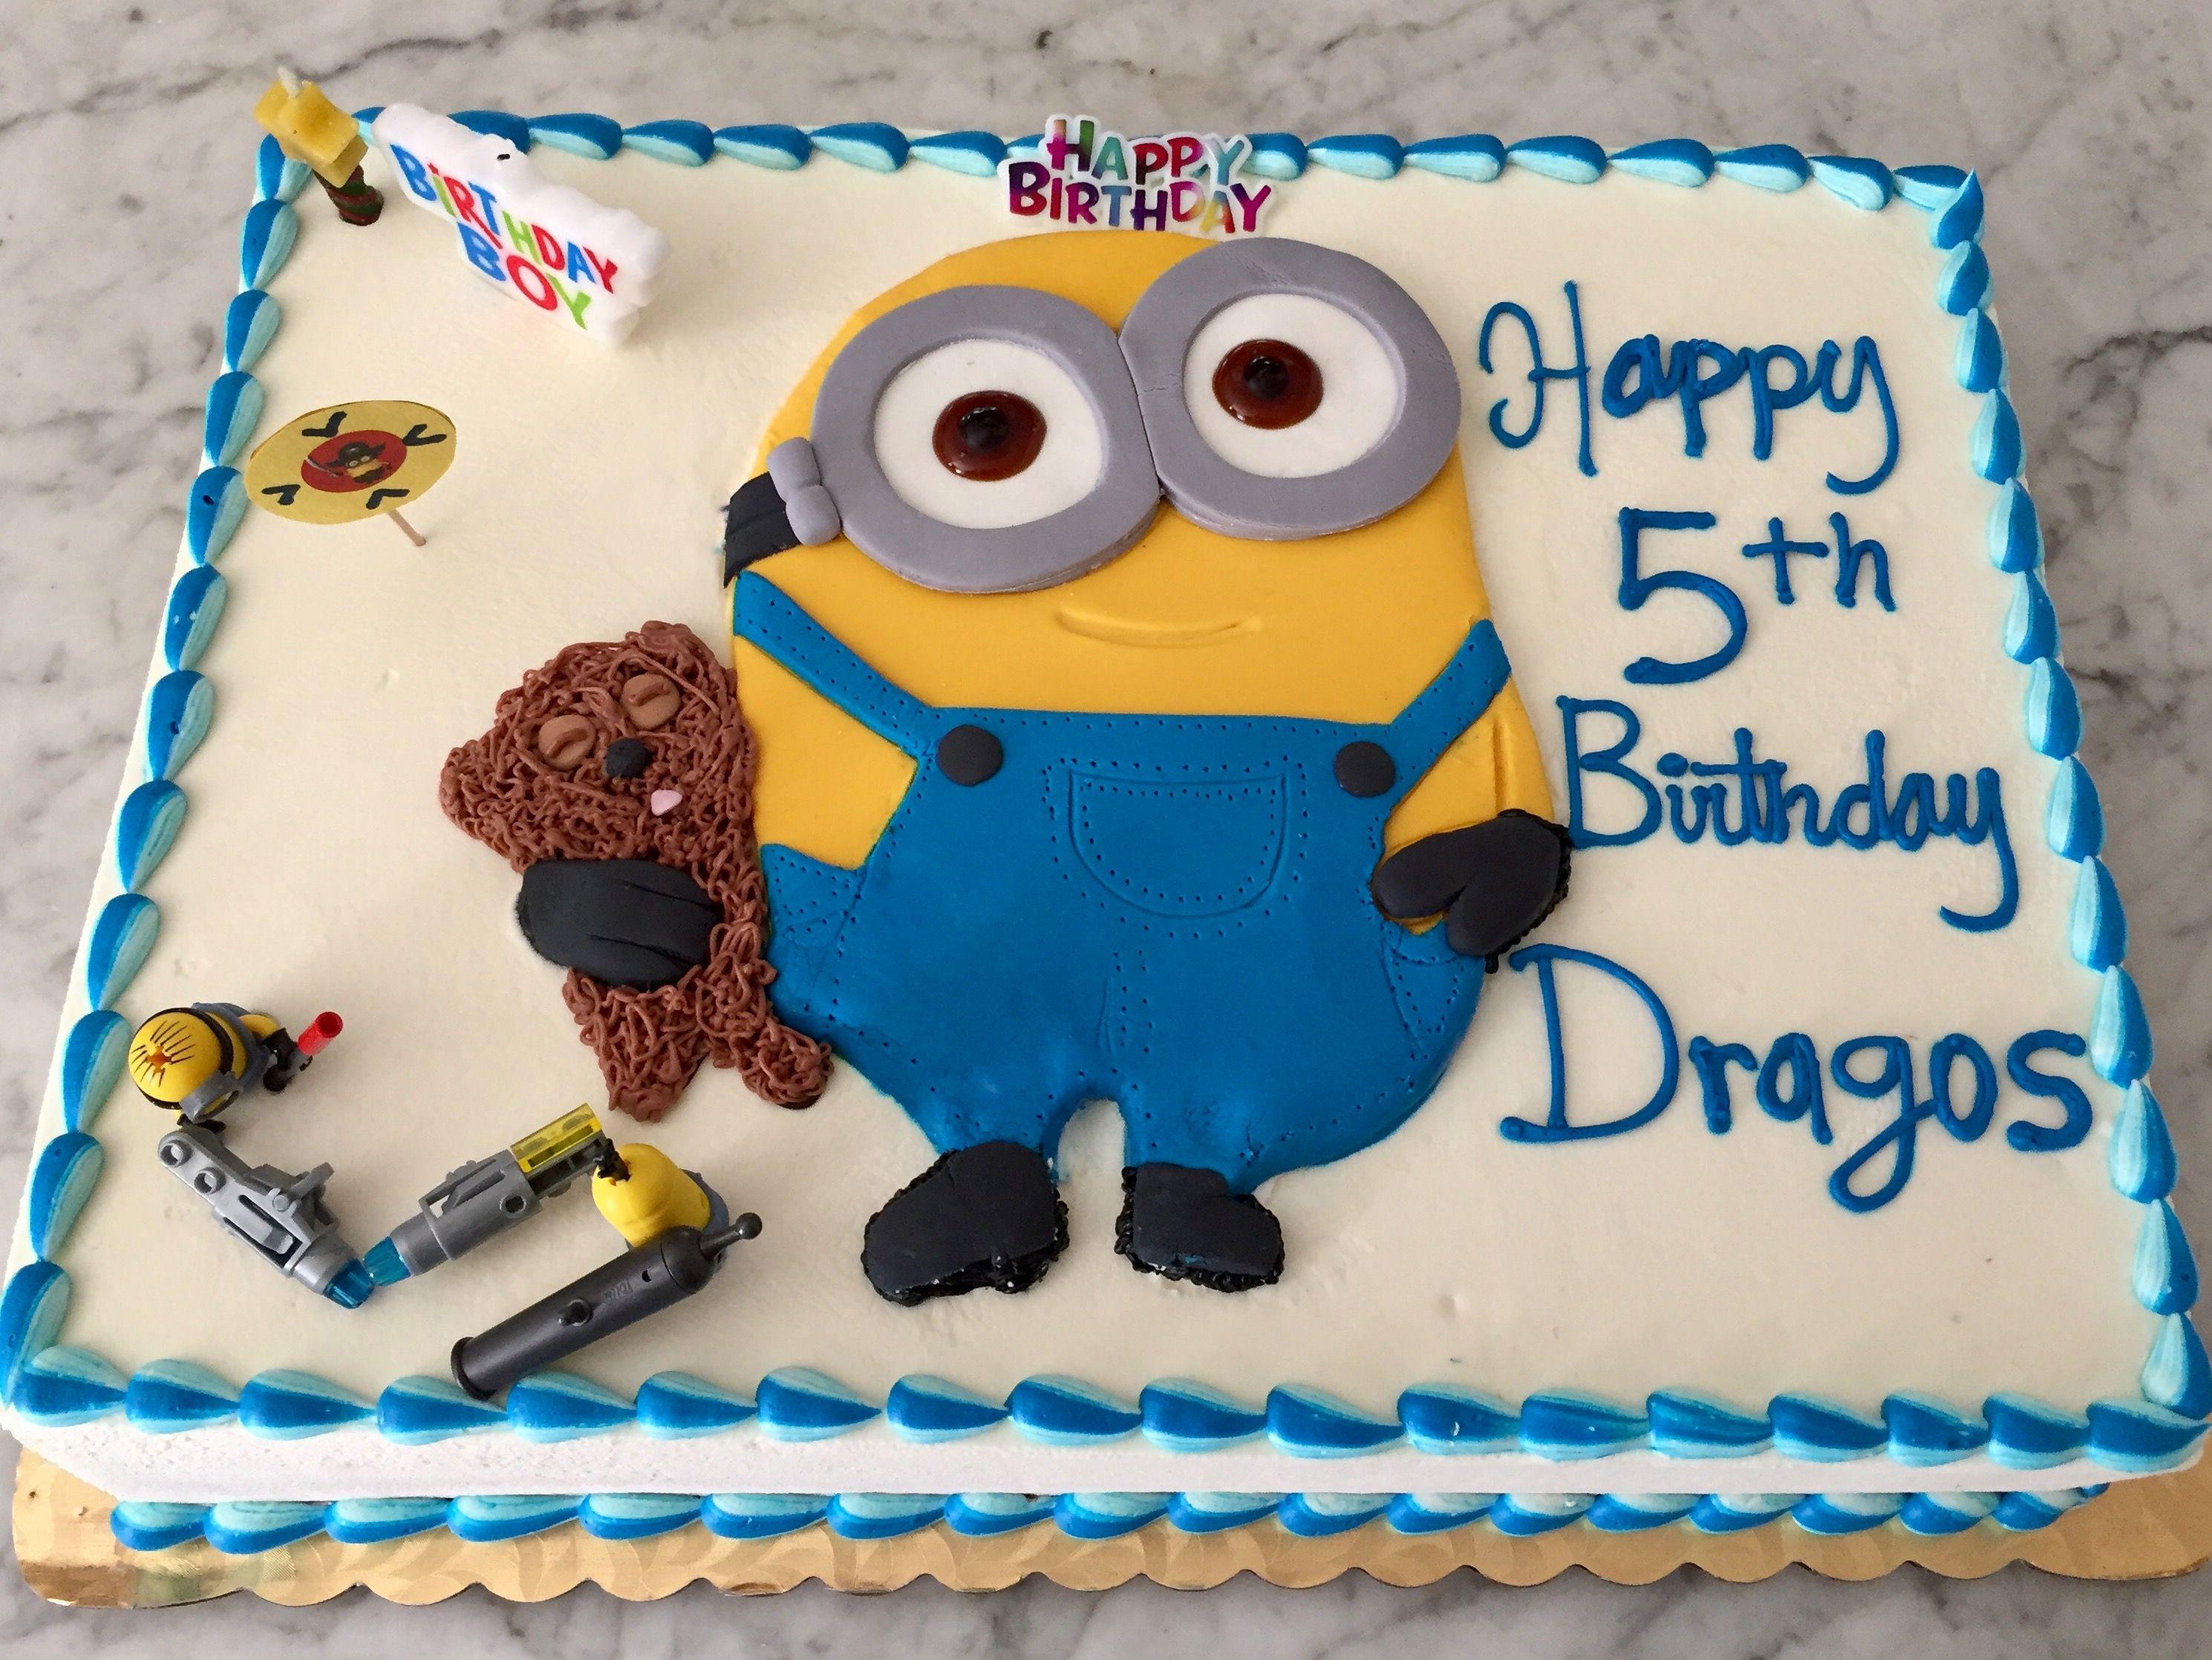 Strange Minion Birthday Cake My Five Year Old Loved This Fresh Whipped Funny Birthday Cards Online Unhofree Goldxyz